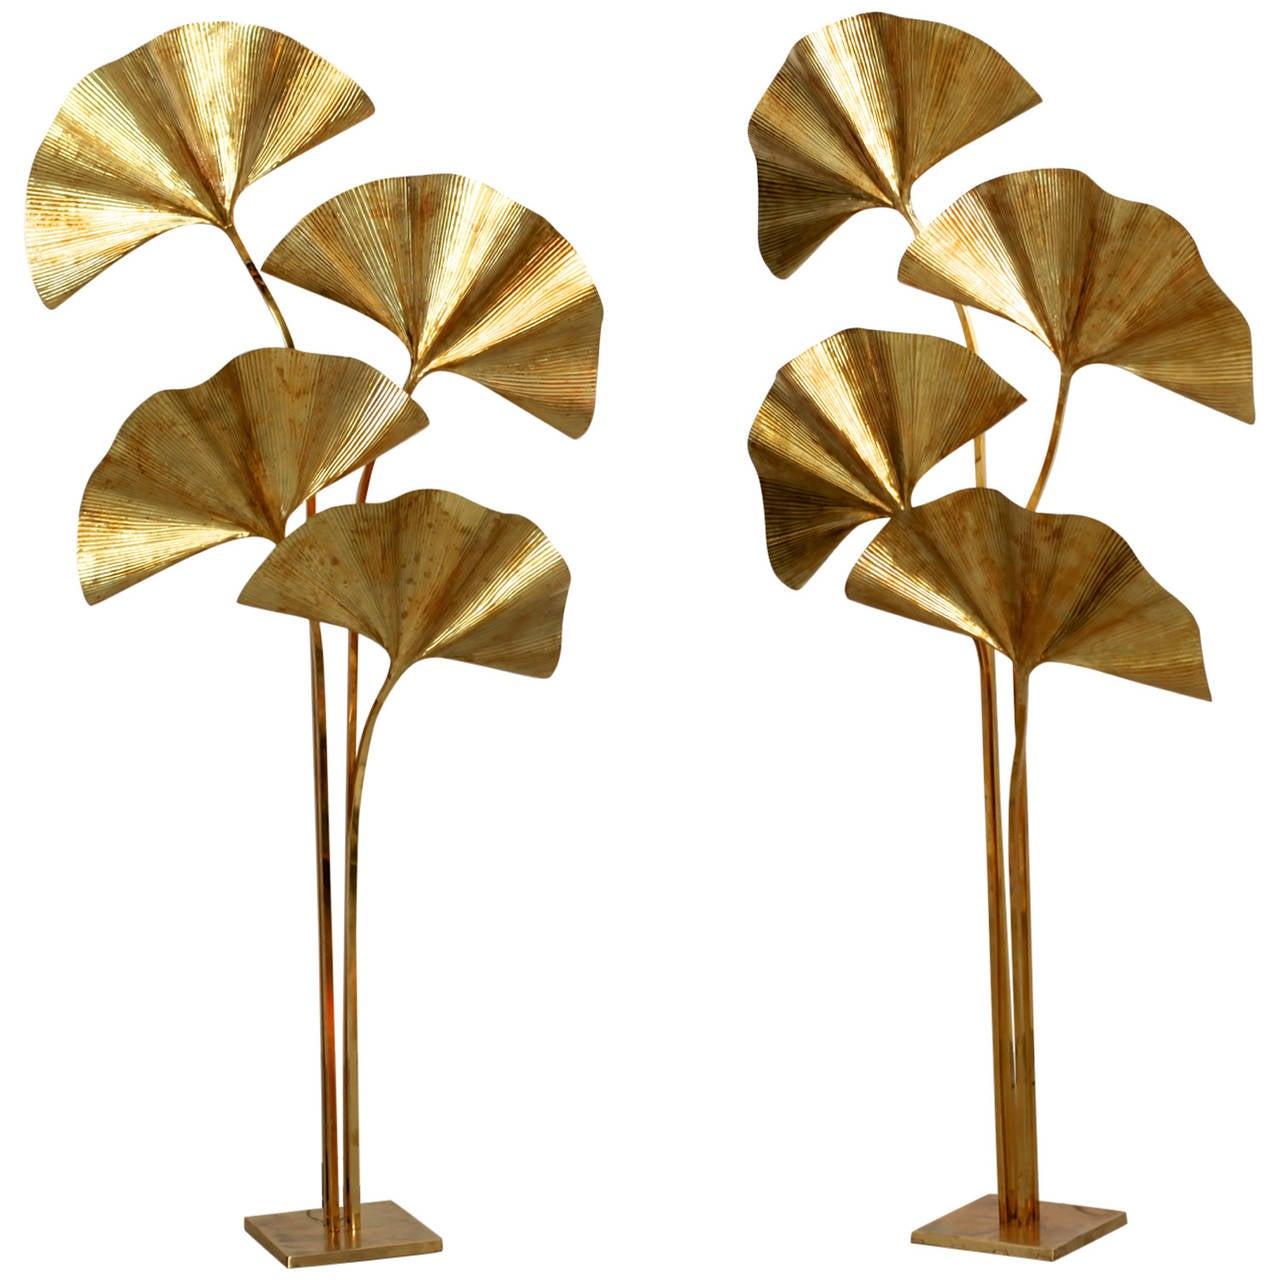 Huge Four Ginkgo Leaf Brass Floor Lamp by Tommaso Barbi 1 - Huge Four Ginkgo Leaf Brass Floor Lamp By Tommaso Barbi For Sale